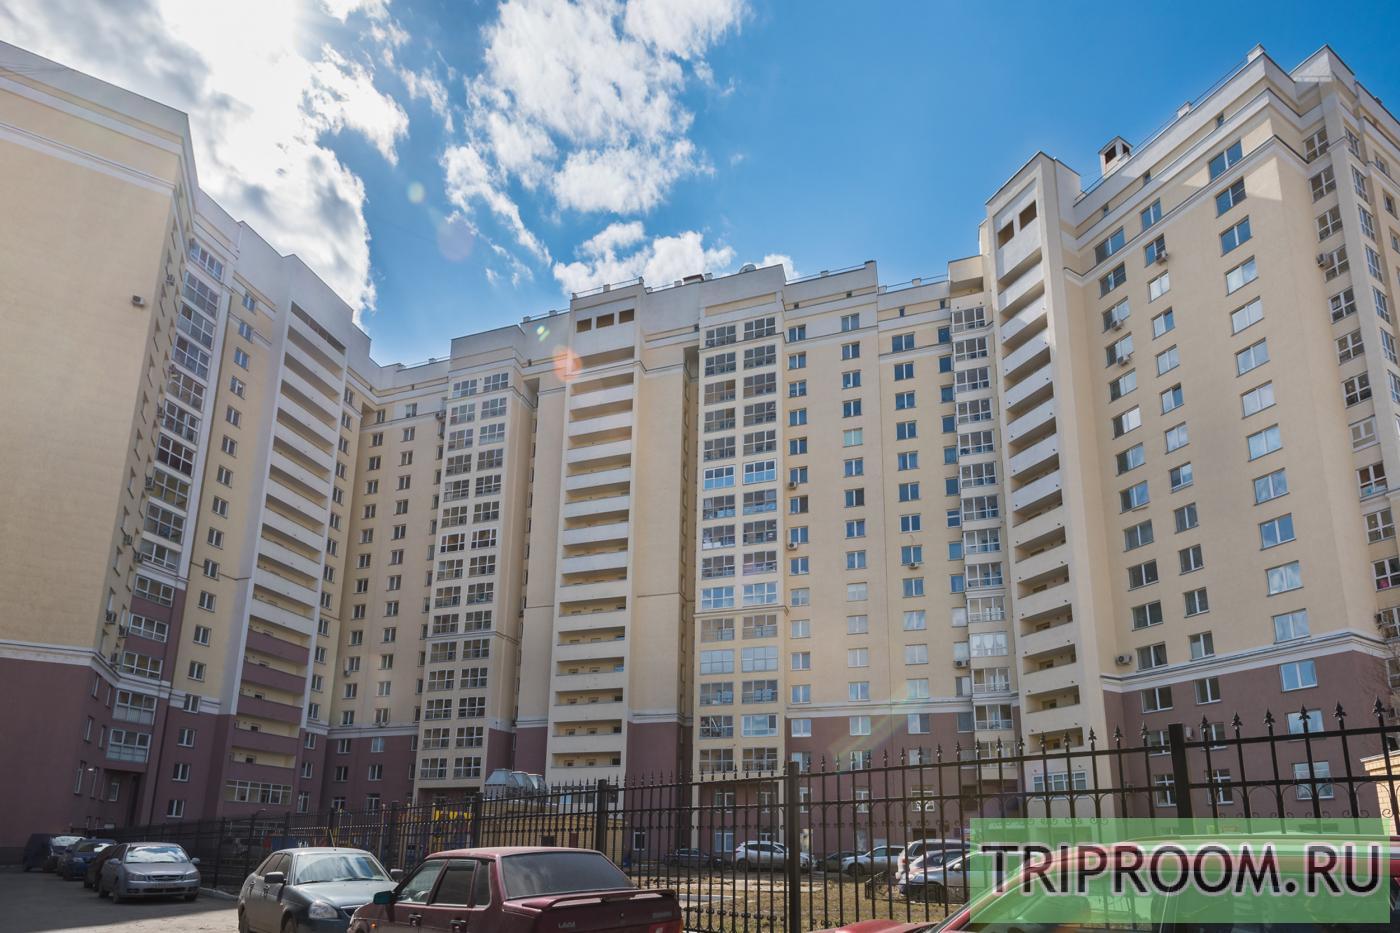 1-комнатная квартира посуточно (вариант № 16259), ул. Смазчиков улица, фото № 9